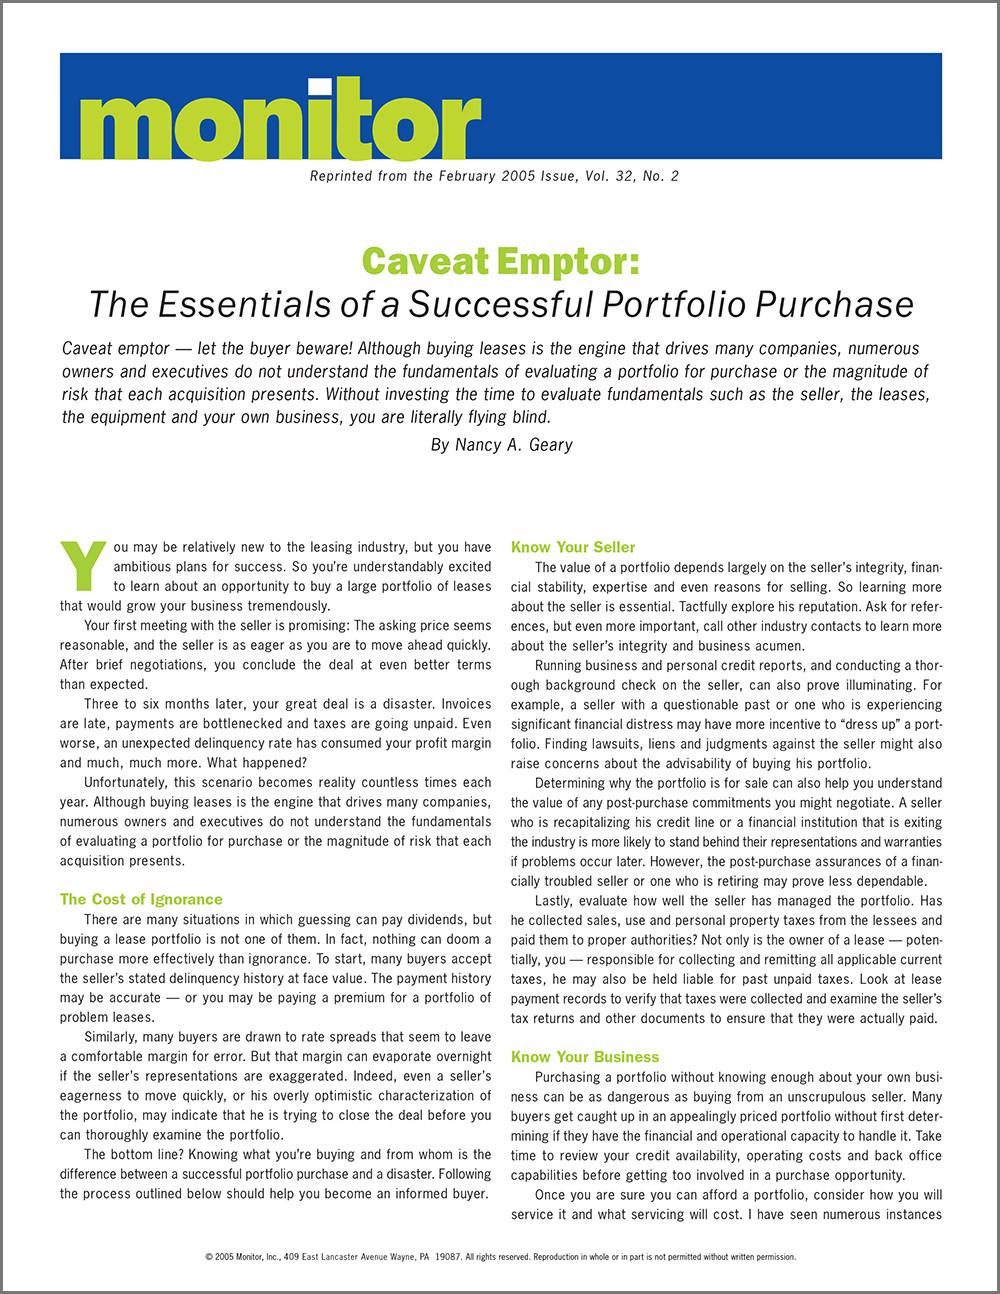 Article: Essentials of a Successful Portfolio Purchase